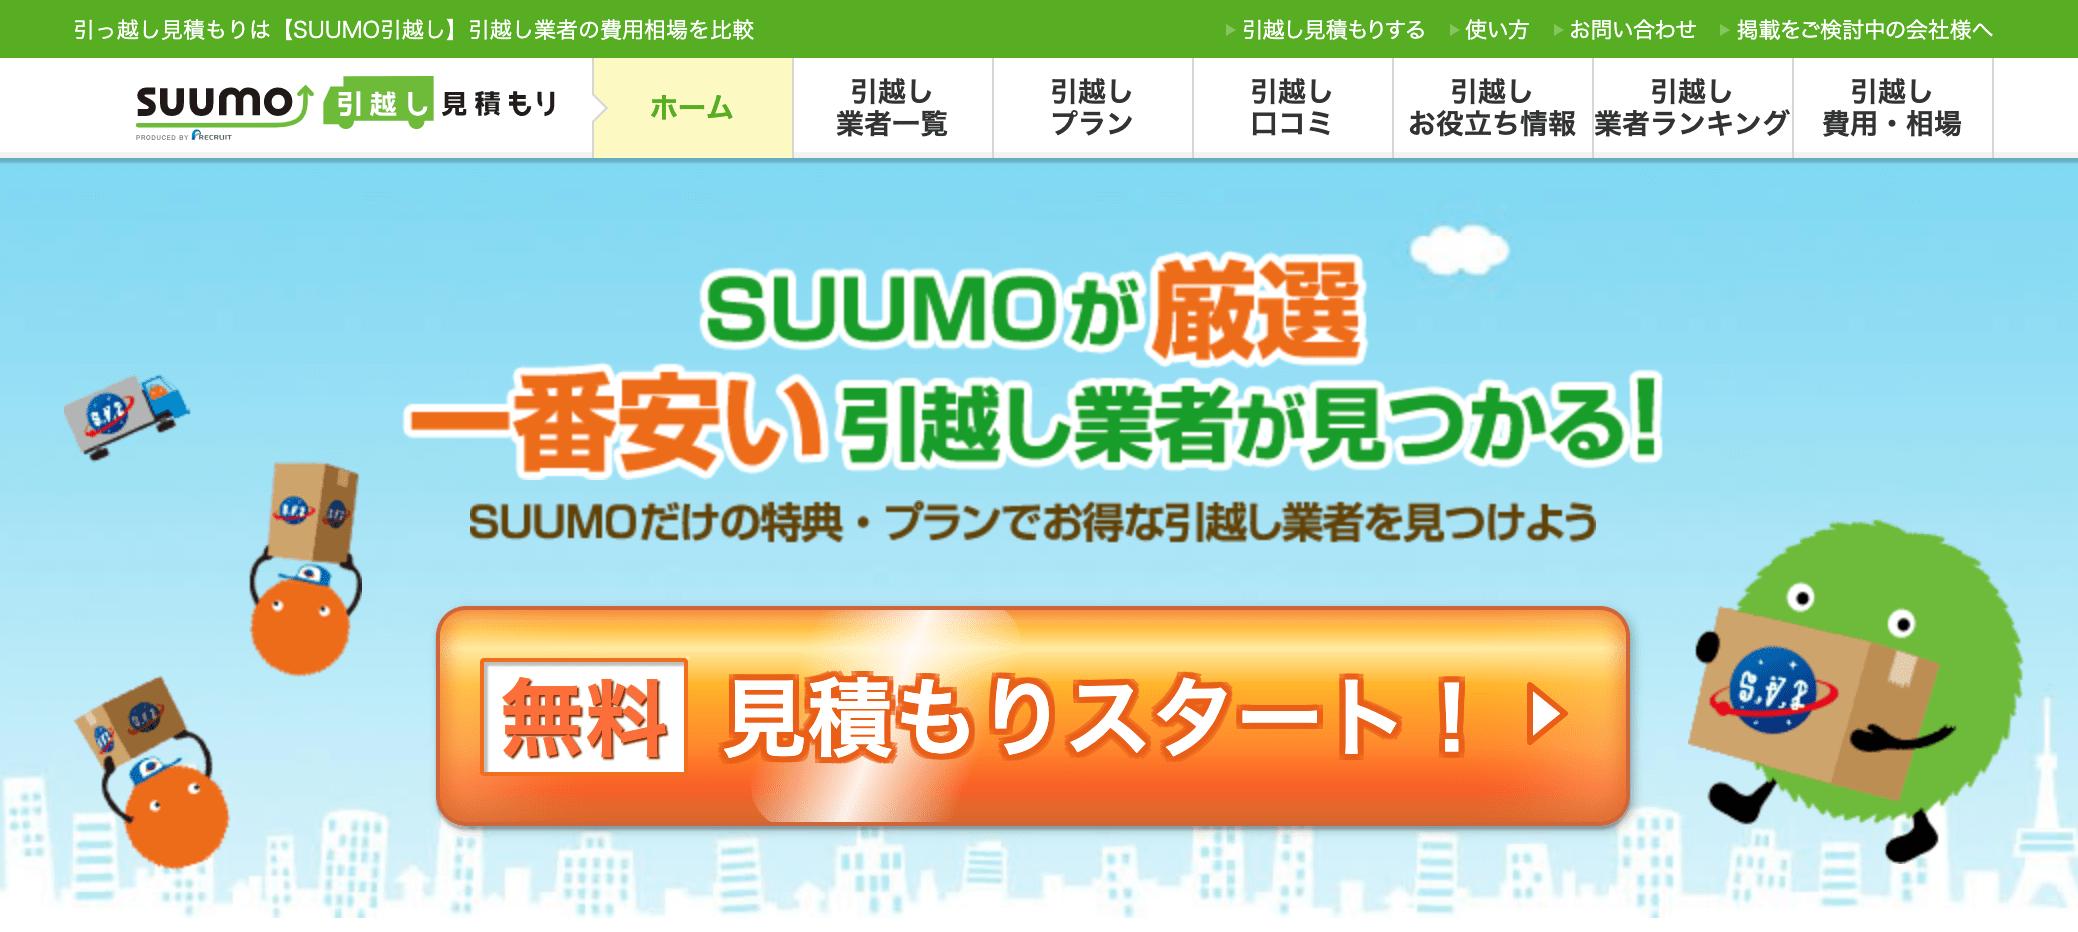 SUUMO引っ越しの公式ページ